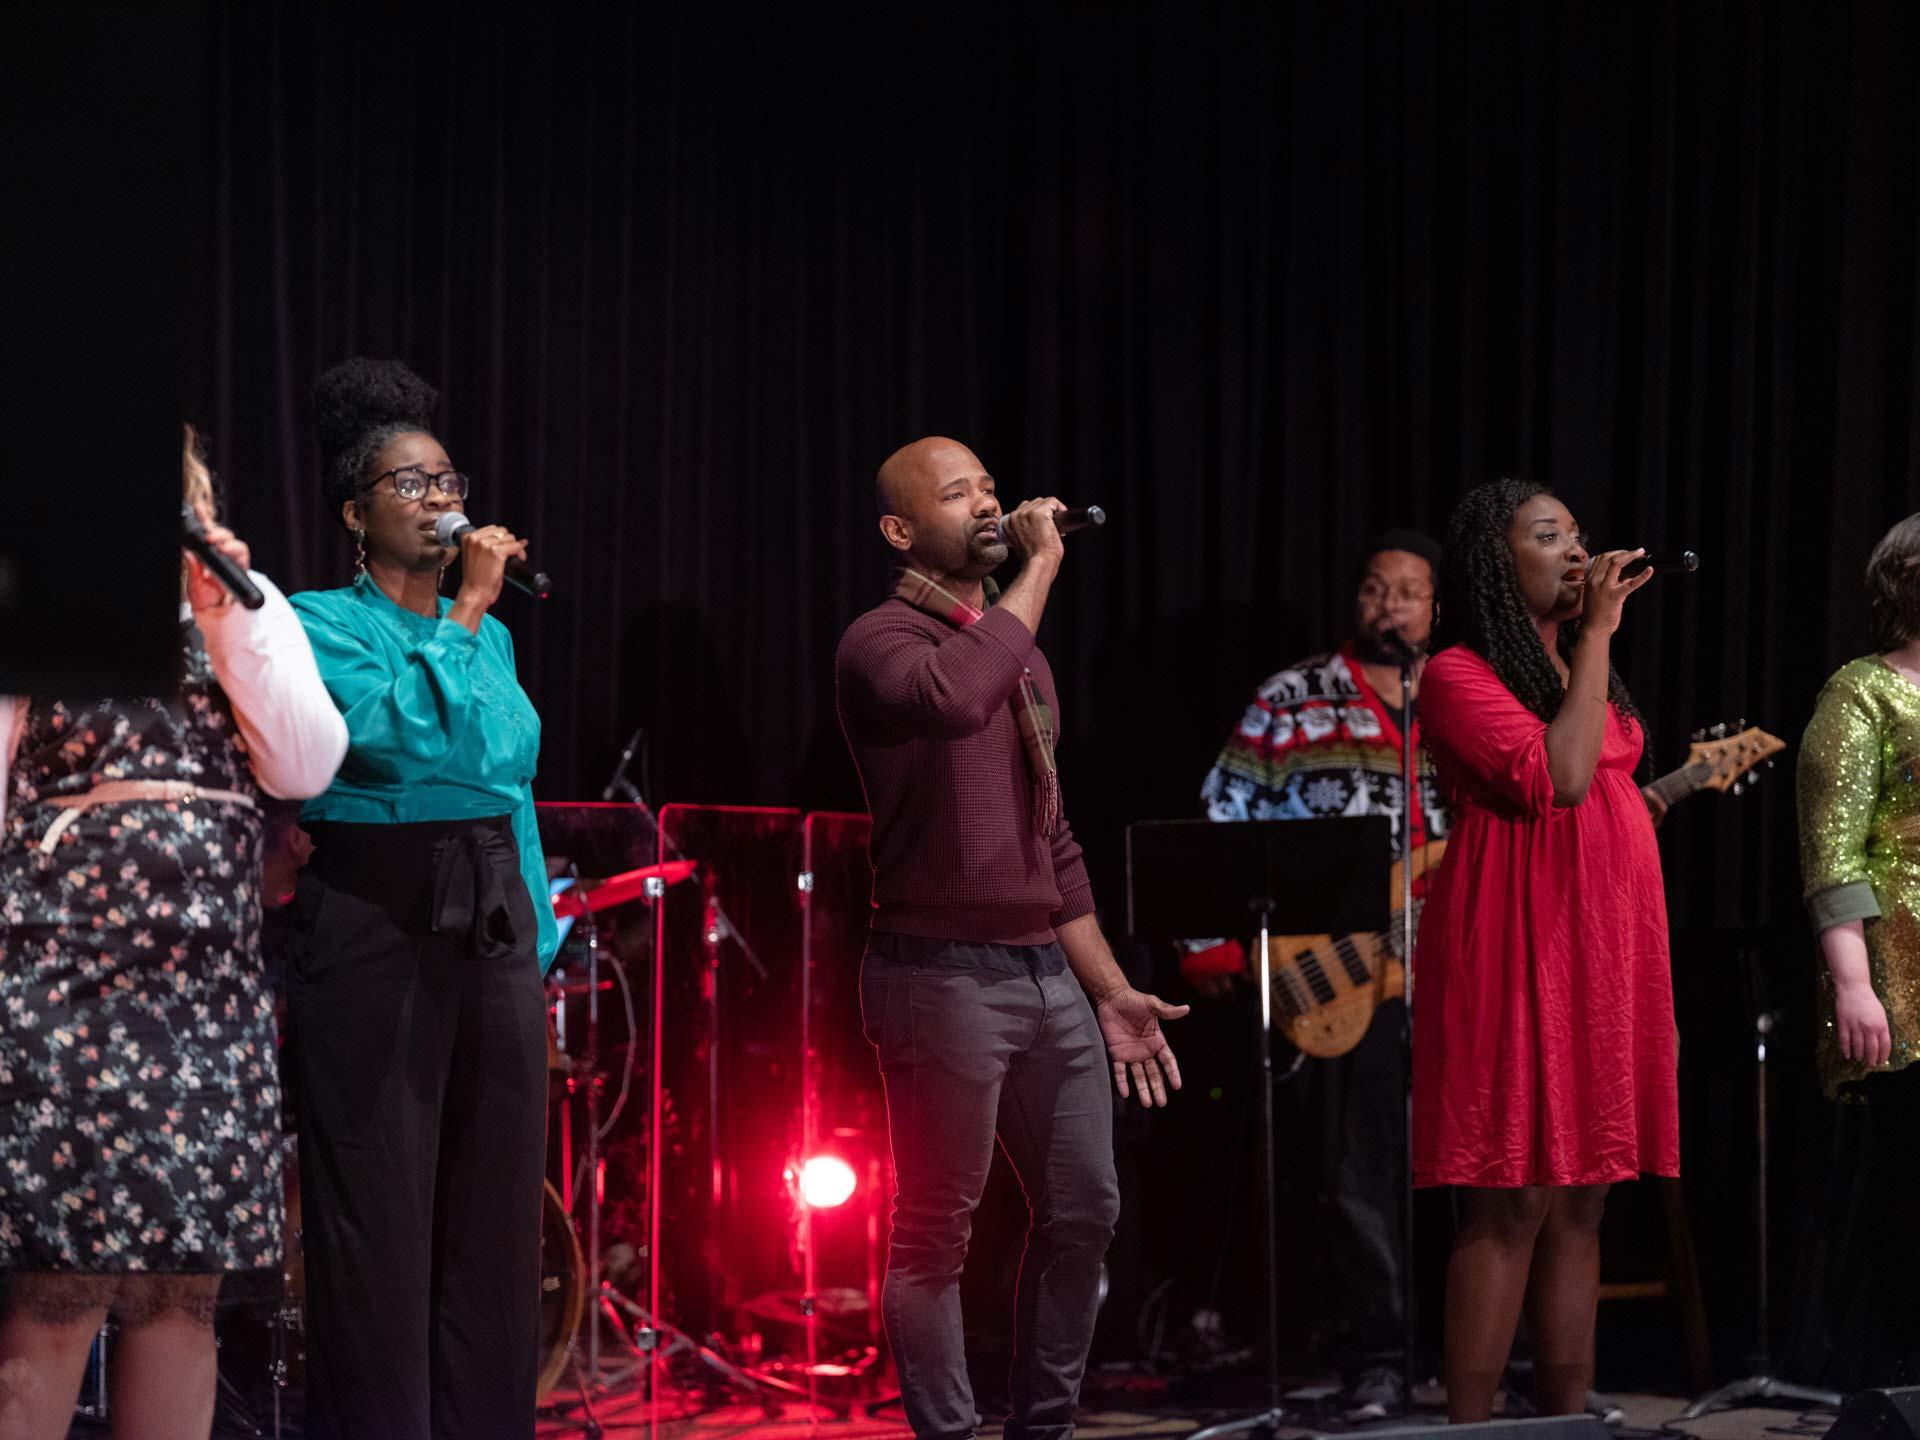 sharing-the-joy-of-the-season-harmony-christmas-benefit-concert-2